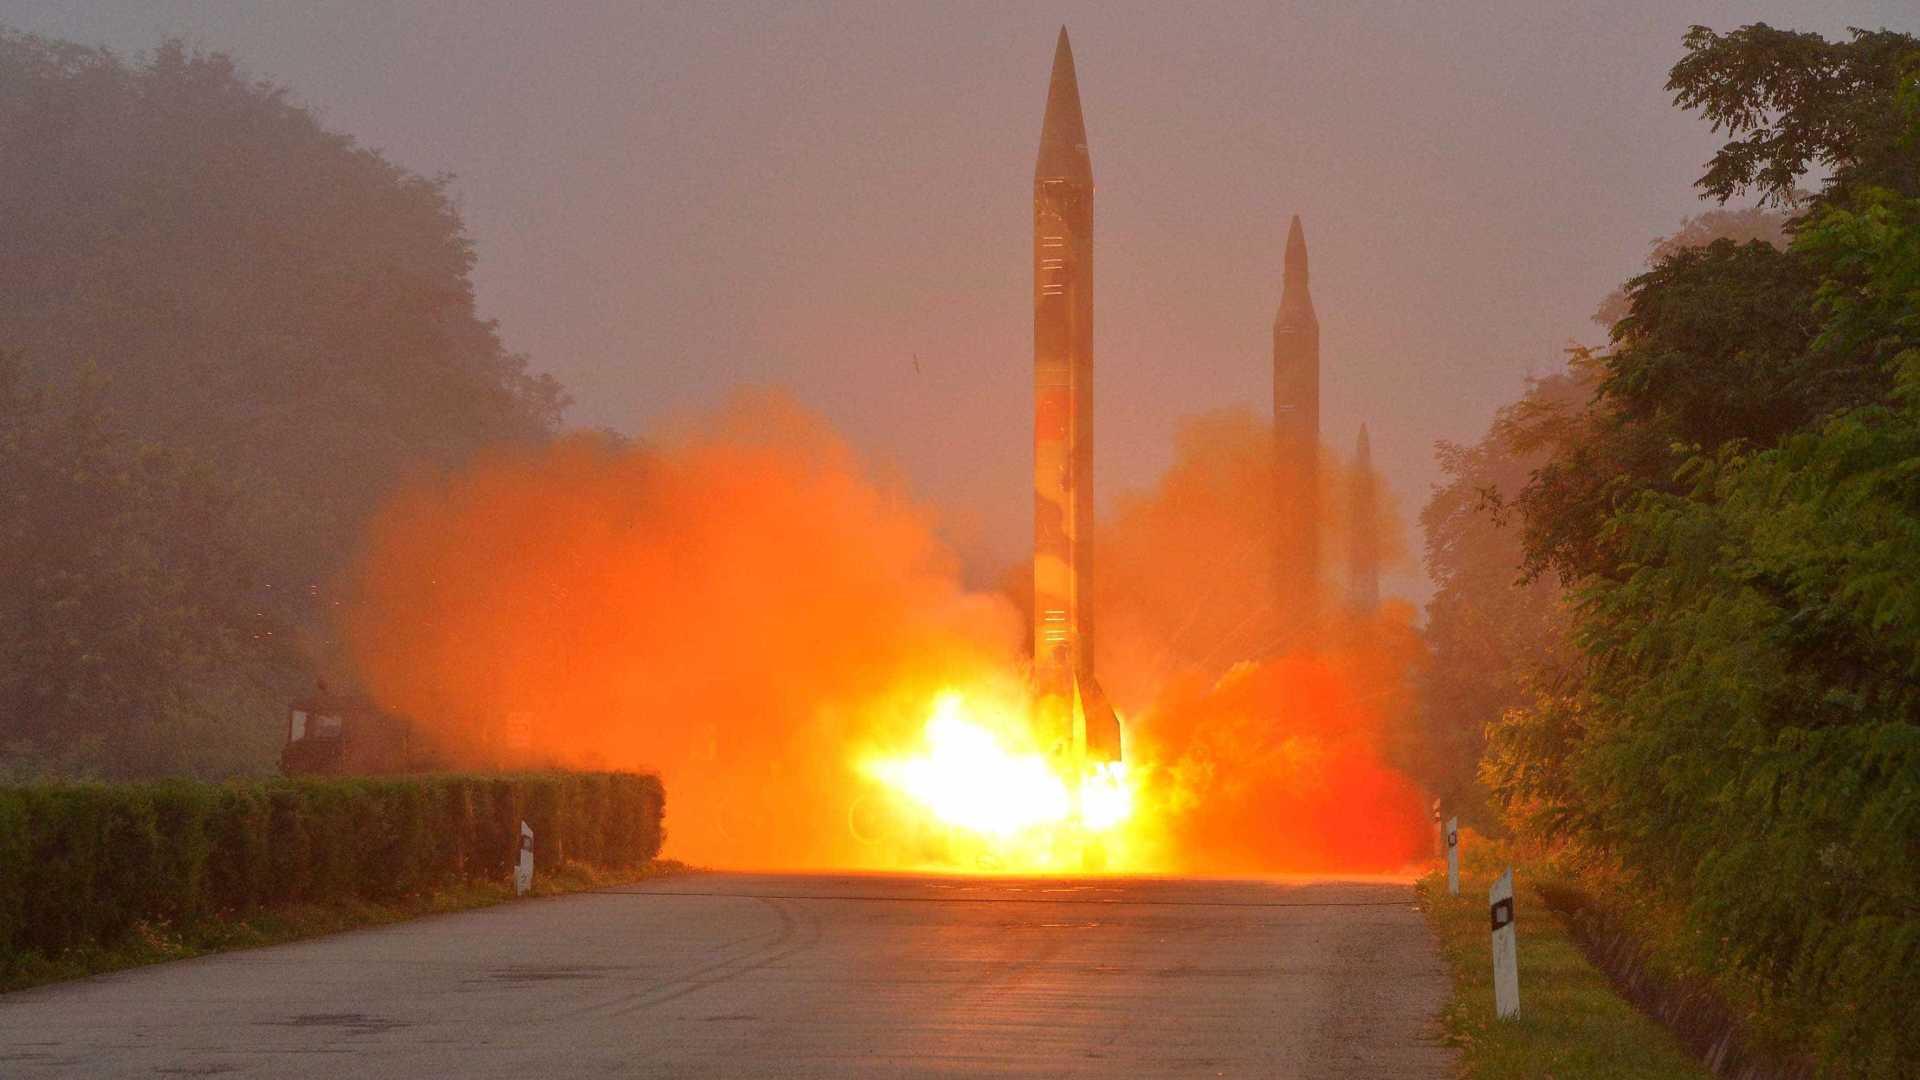 Pyongyang: manobras de Washington e Seul na península 'criam ameaça de guerra'